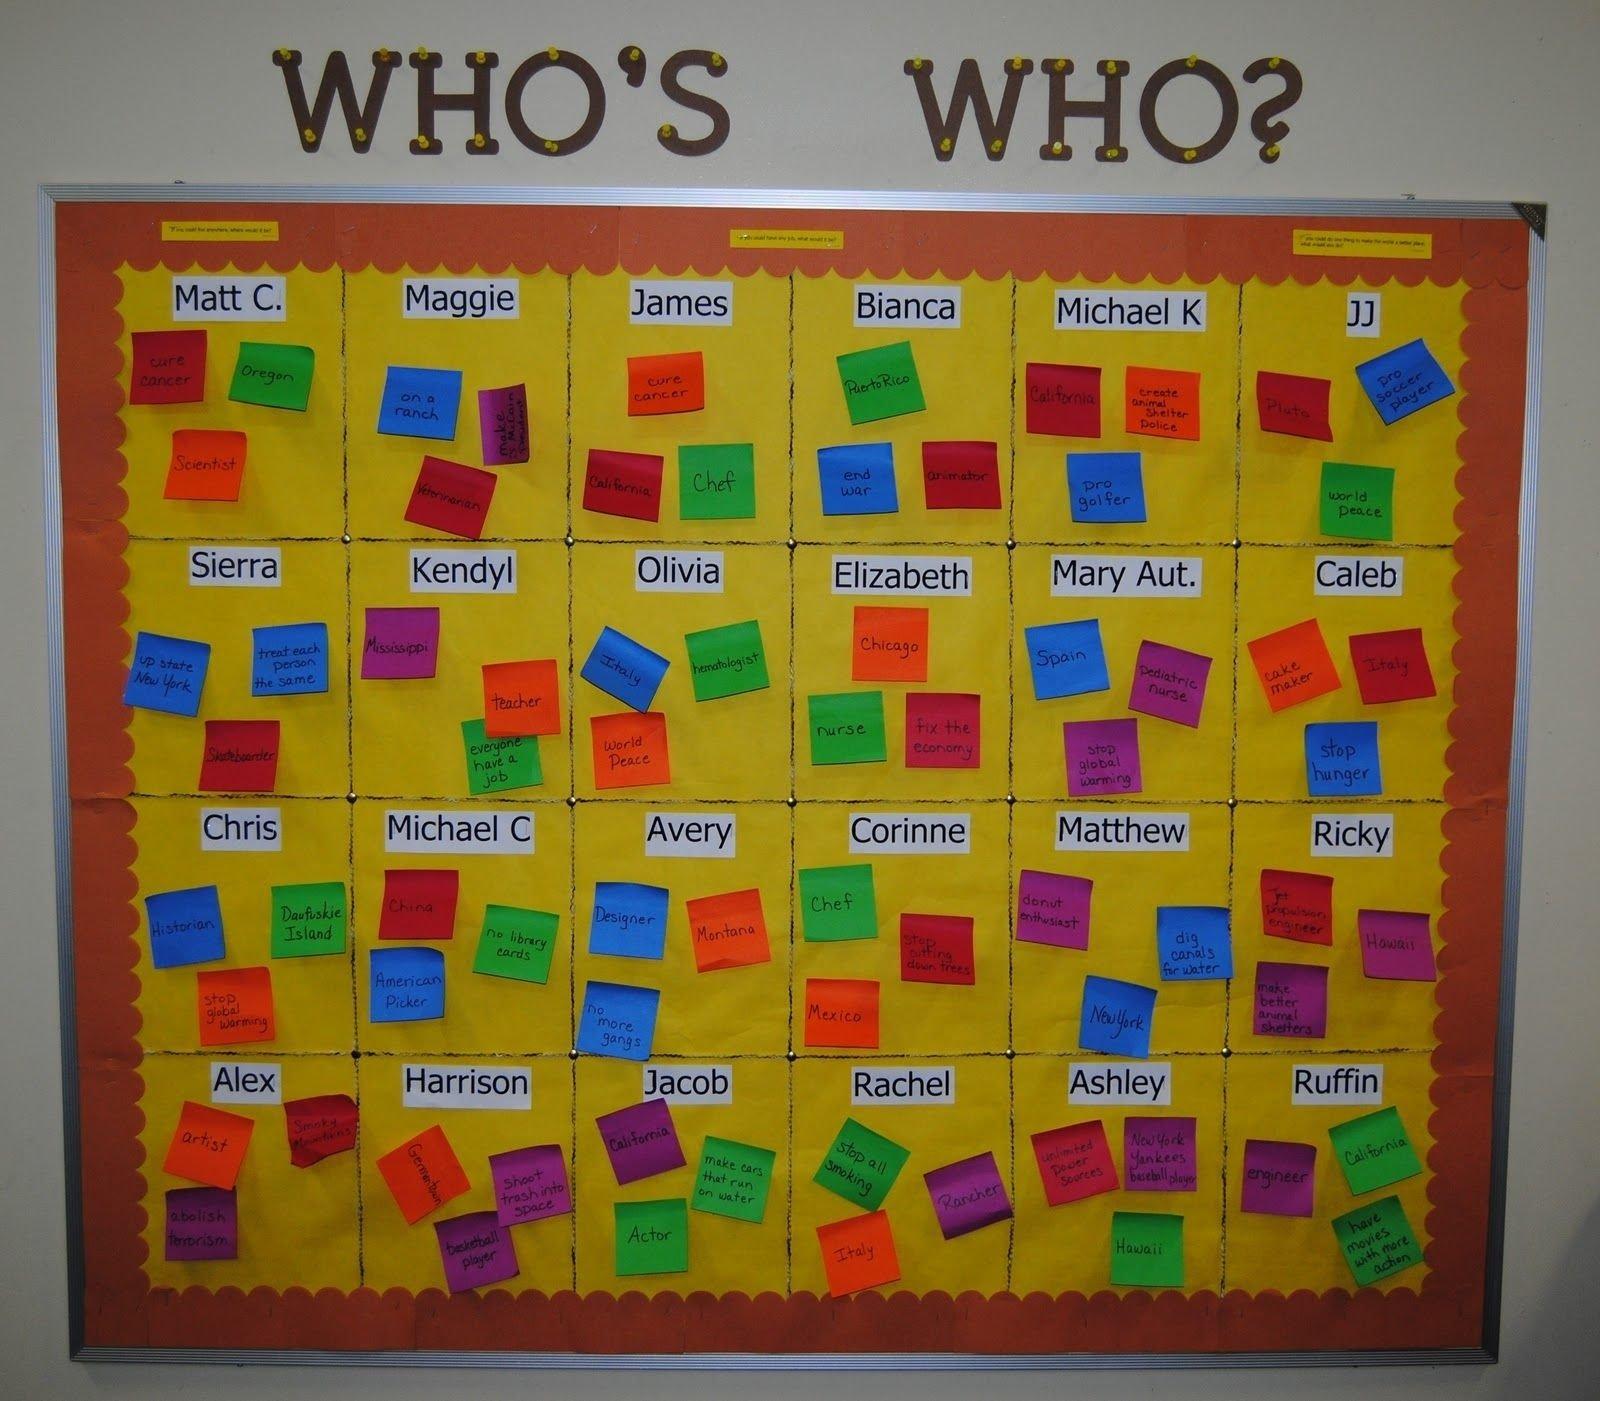 Bulletin Board Ideas For Middle School Math - Karmashares LLC ...